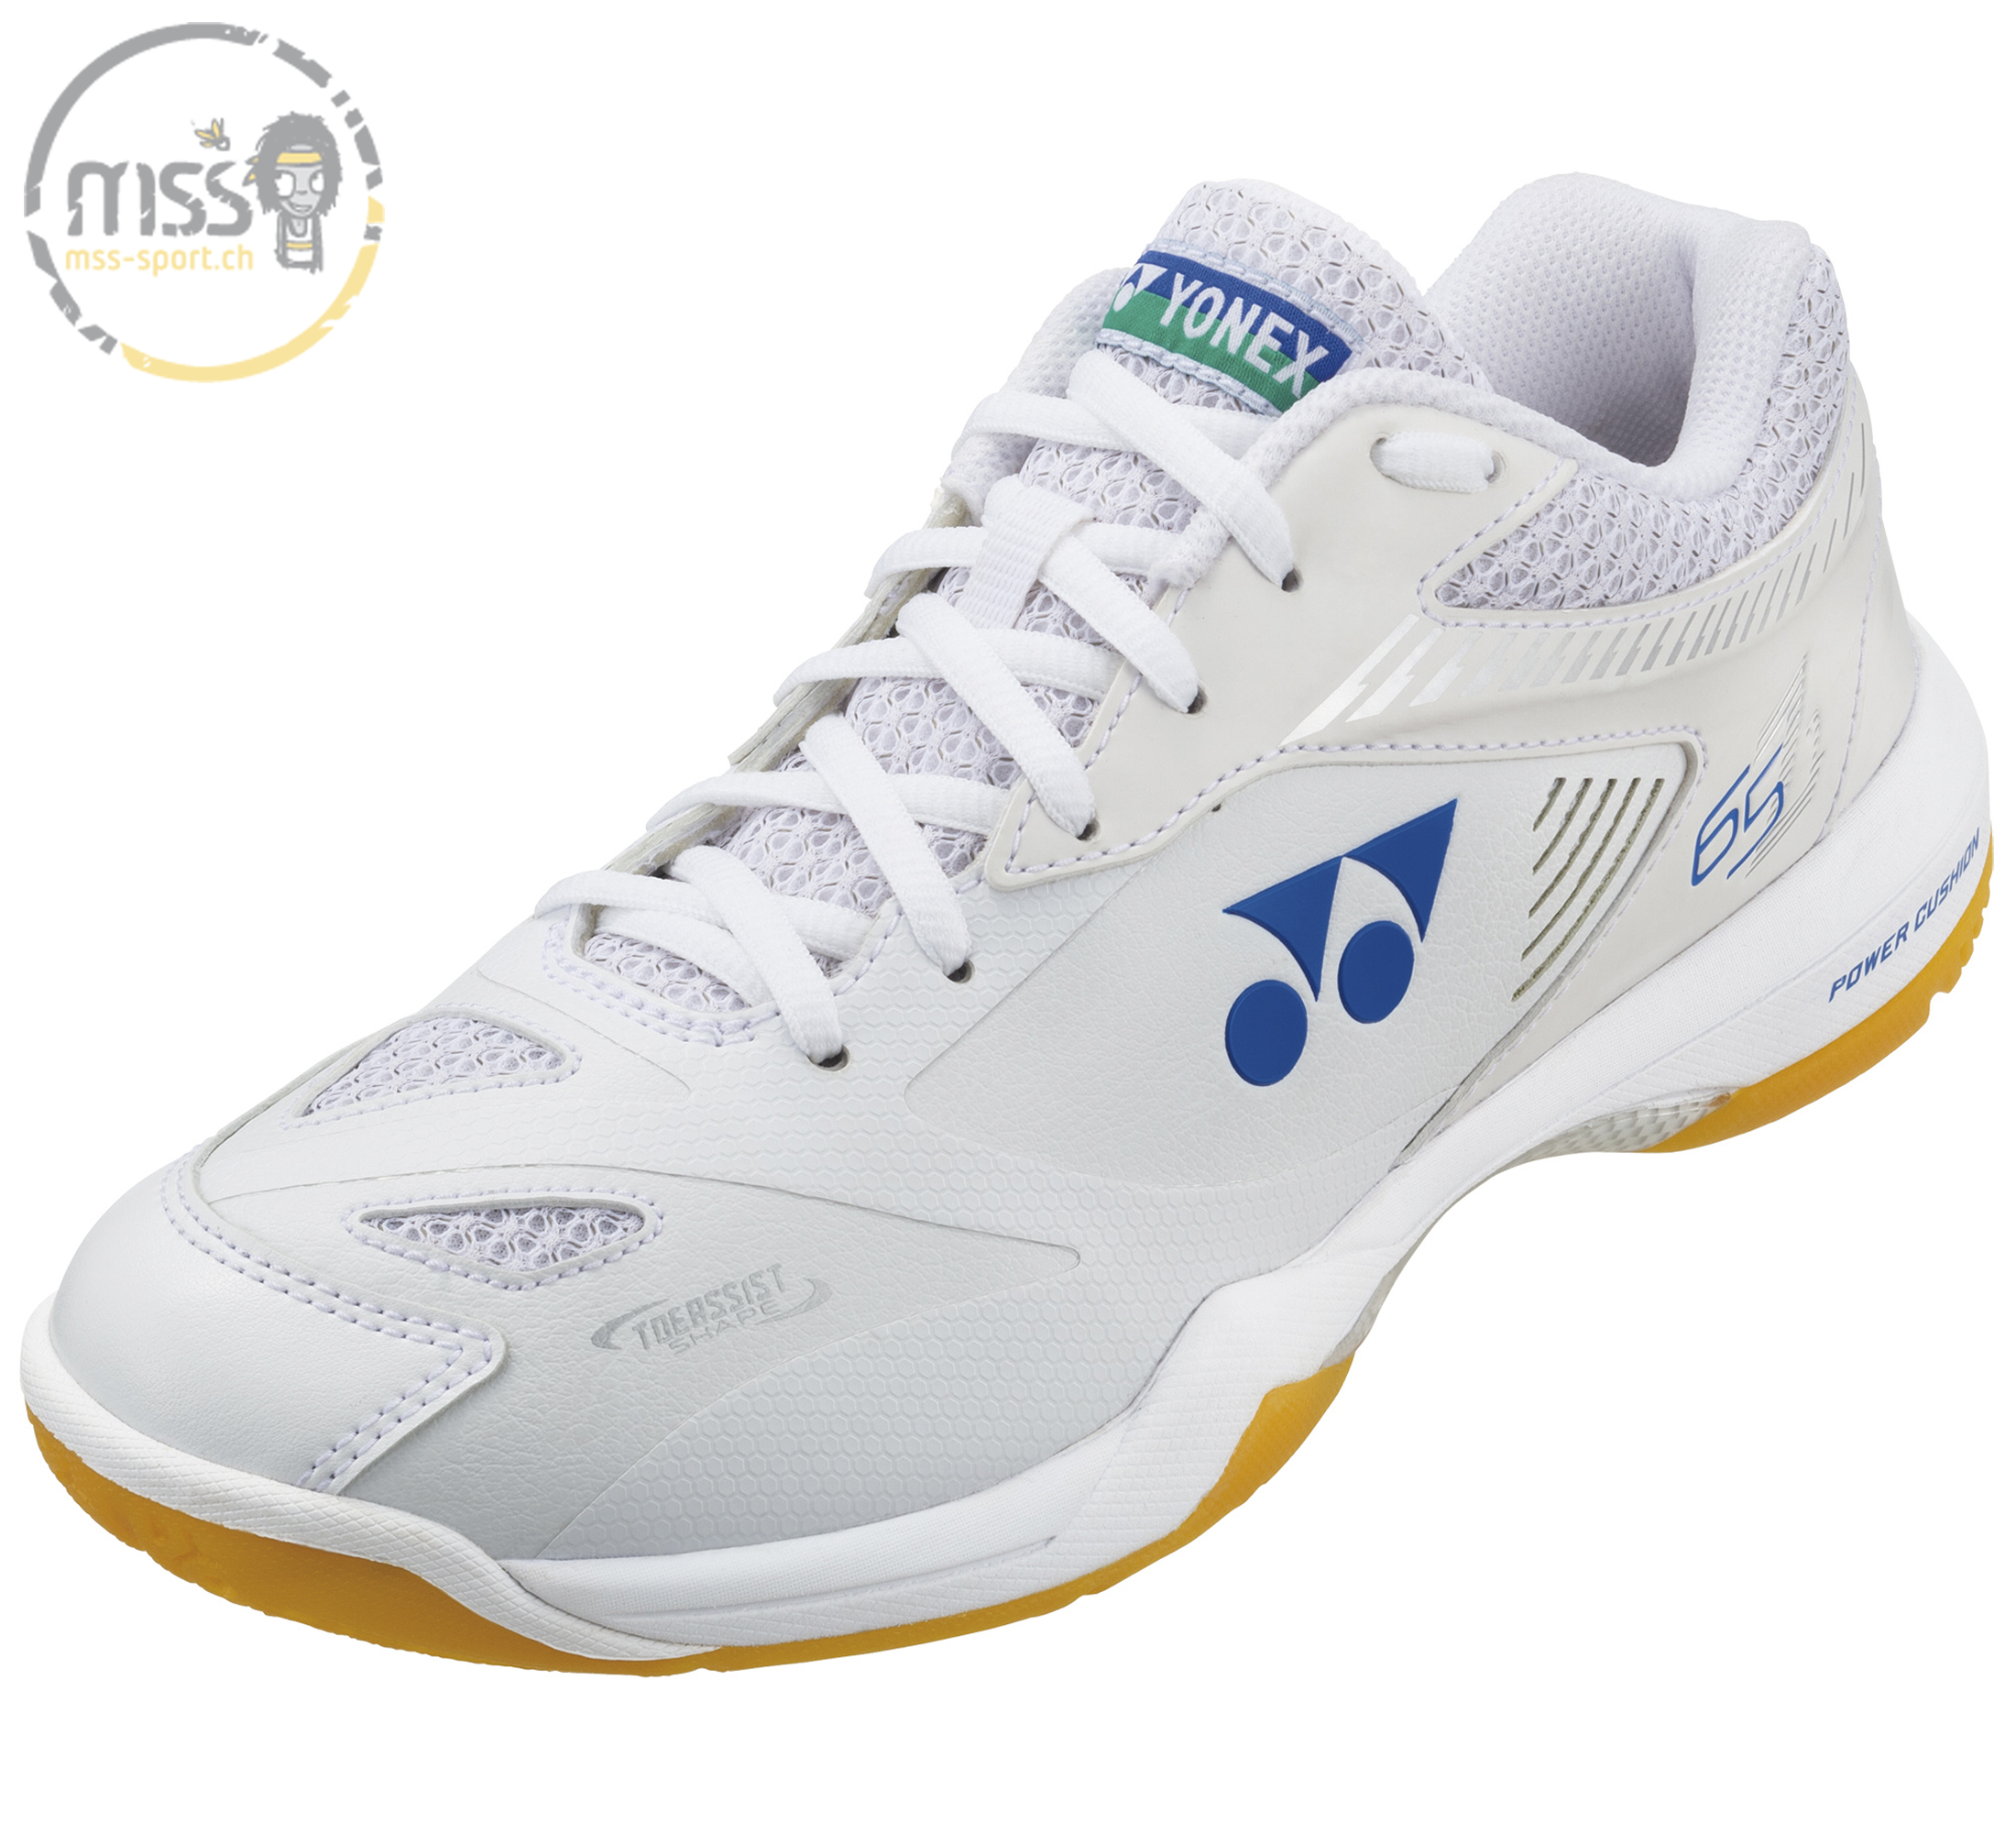 Yonex SHB 65Z2MAEX white